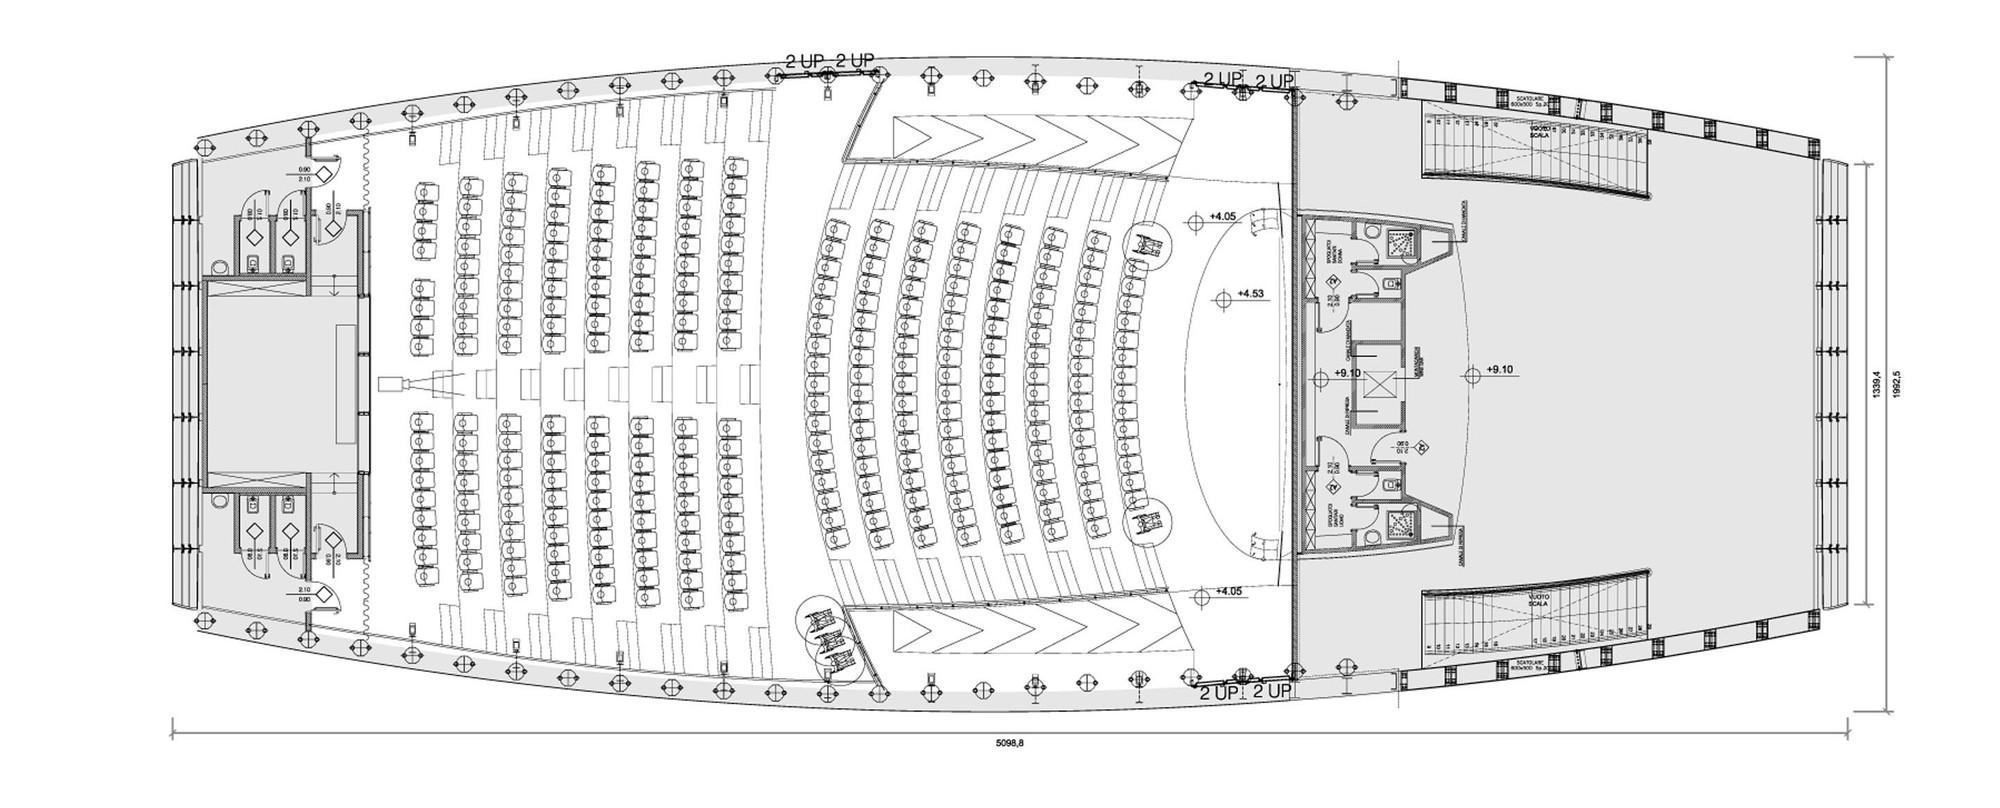 galer a de bagnoli futura silvio d 39 ascia architecture 16. Black Bedroom Furniture Sets. Home Design Ideas